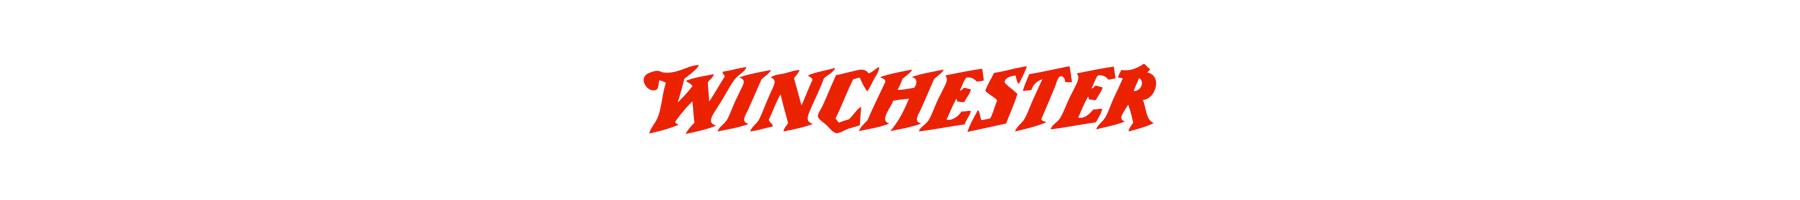 DrJays.com - Winchester